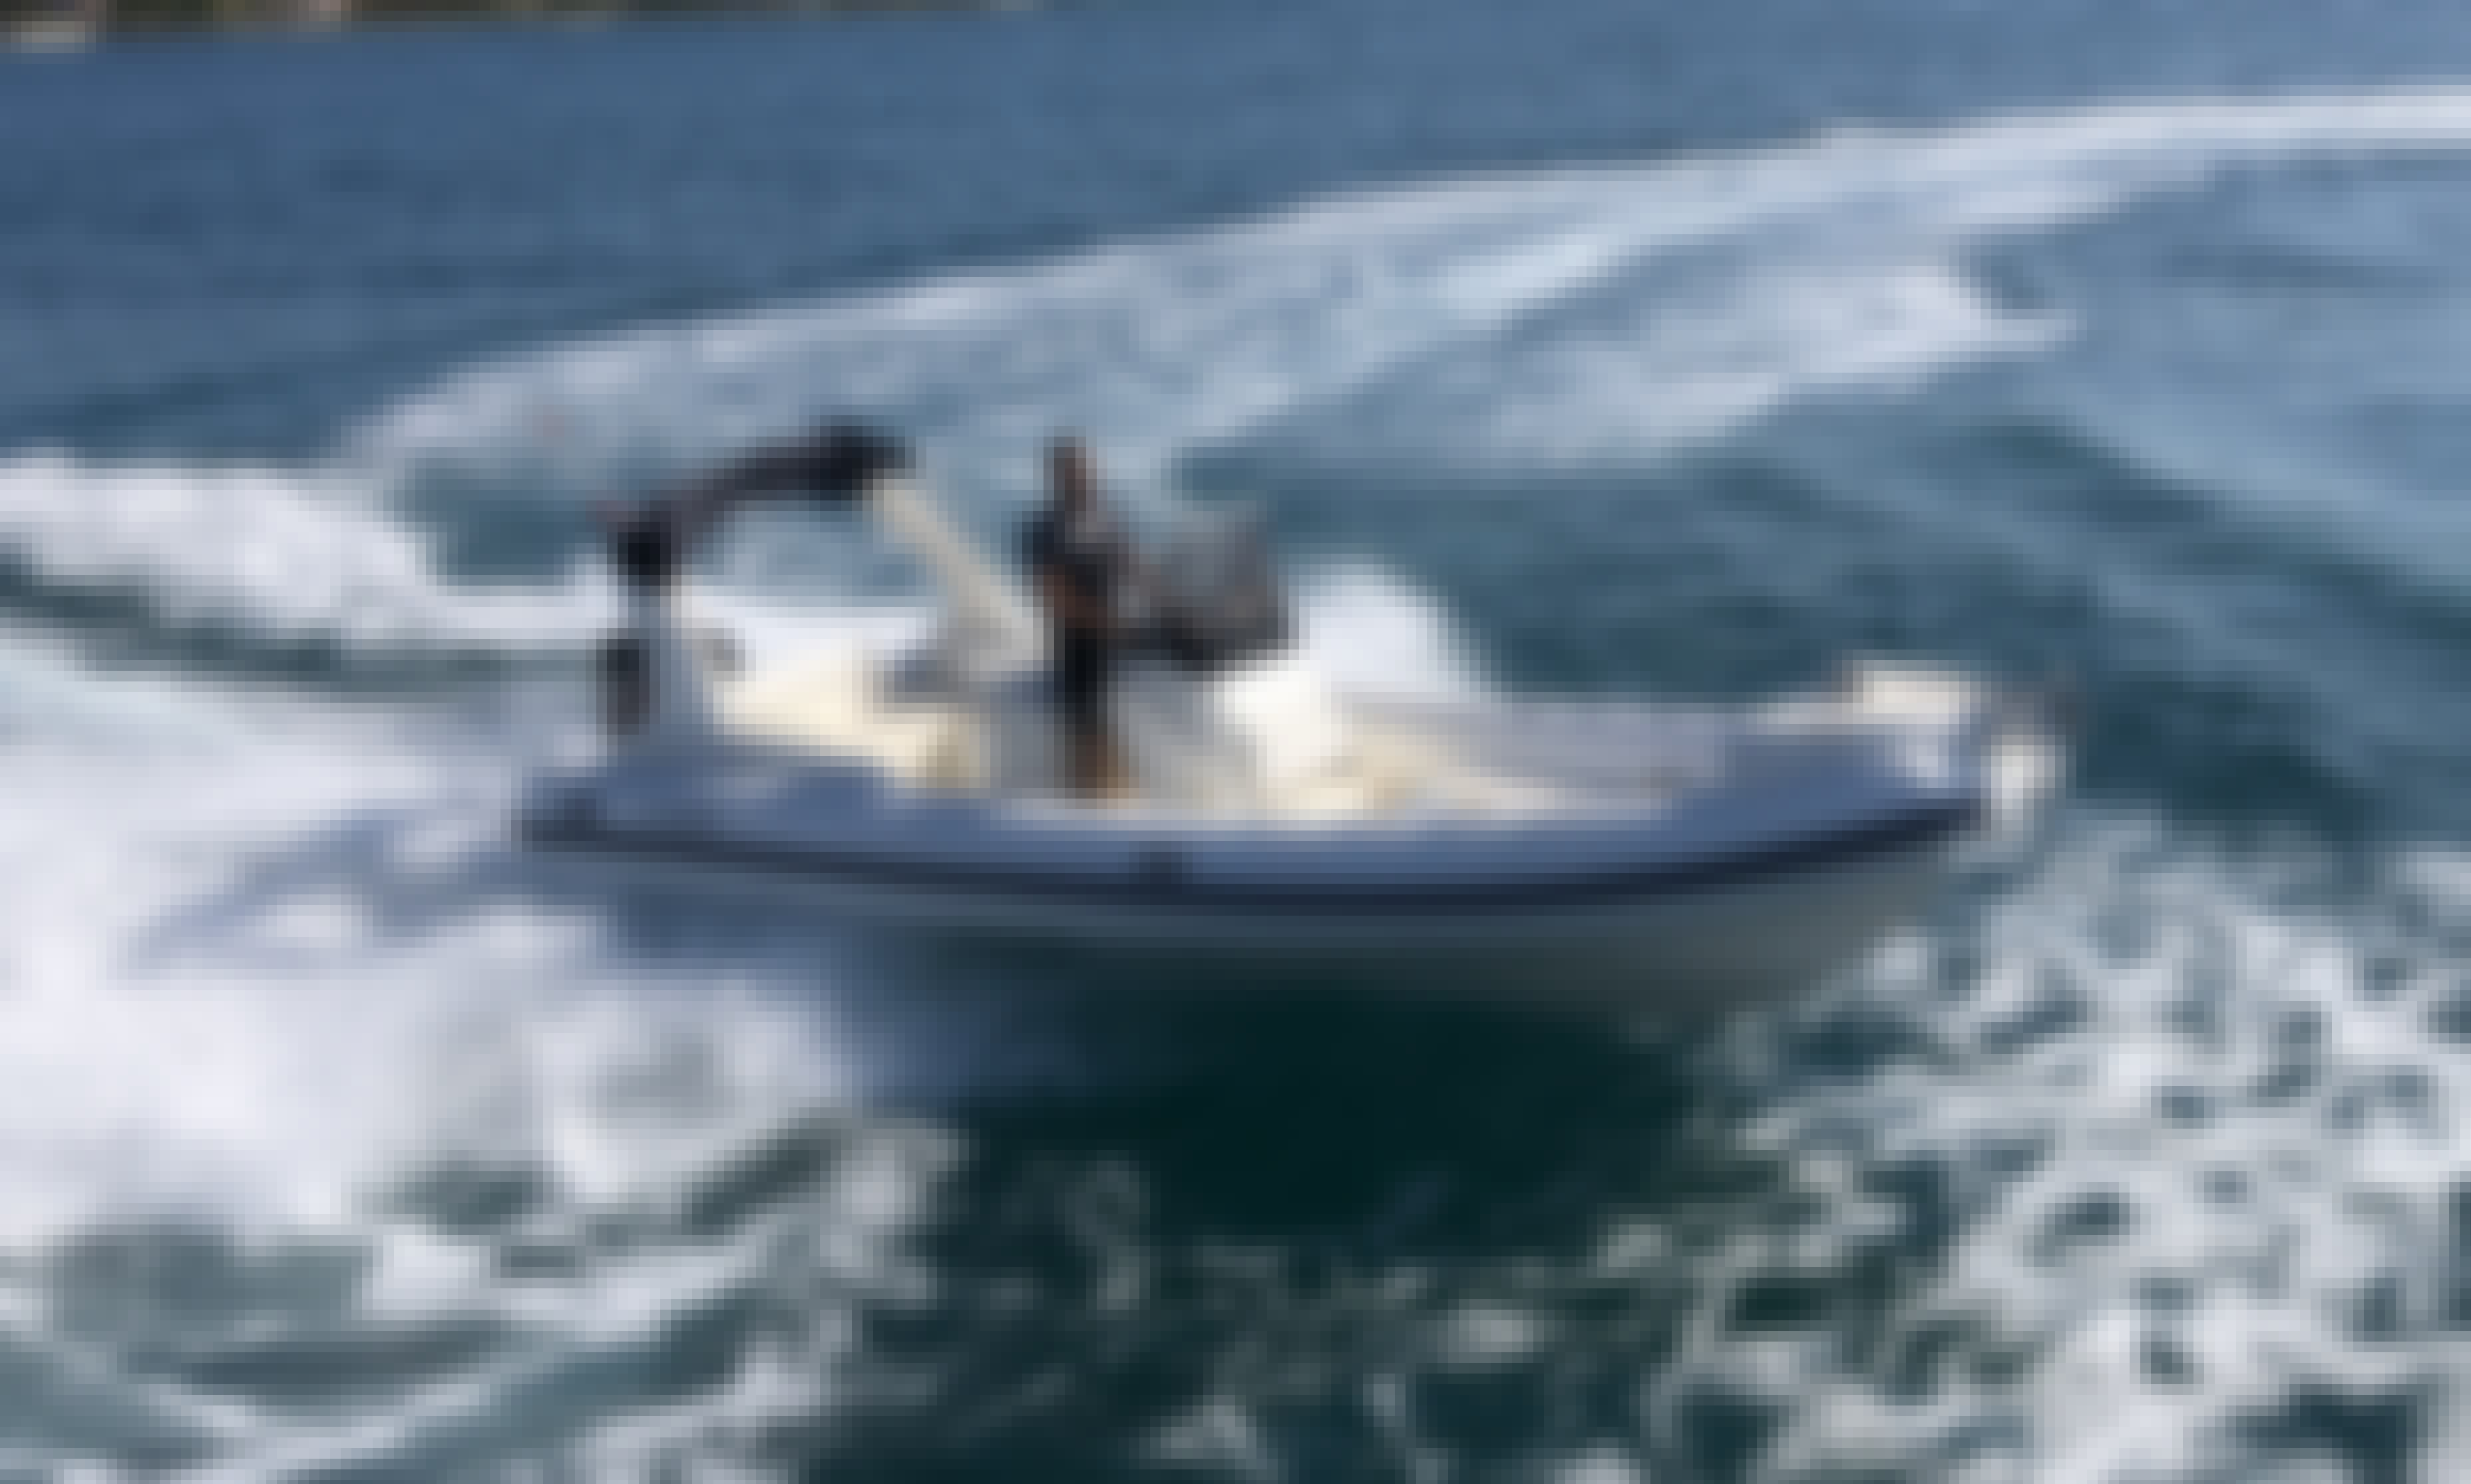 Nuova Jolly King 720 RIB with 250 hp Suzuki Engine for Rent in Biograd na Moru, Croatia